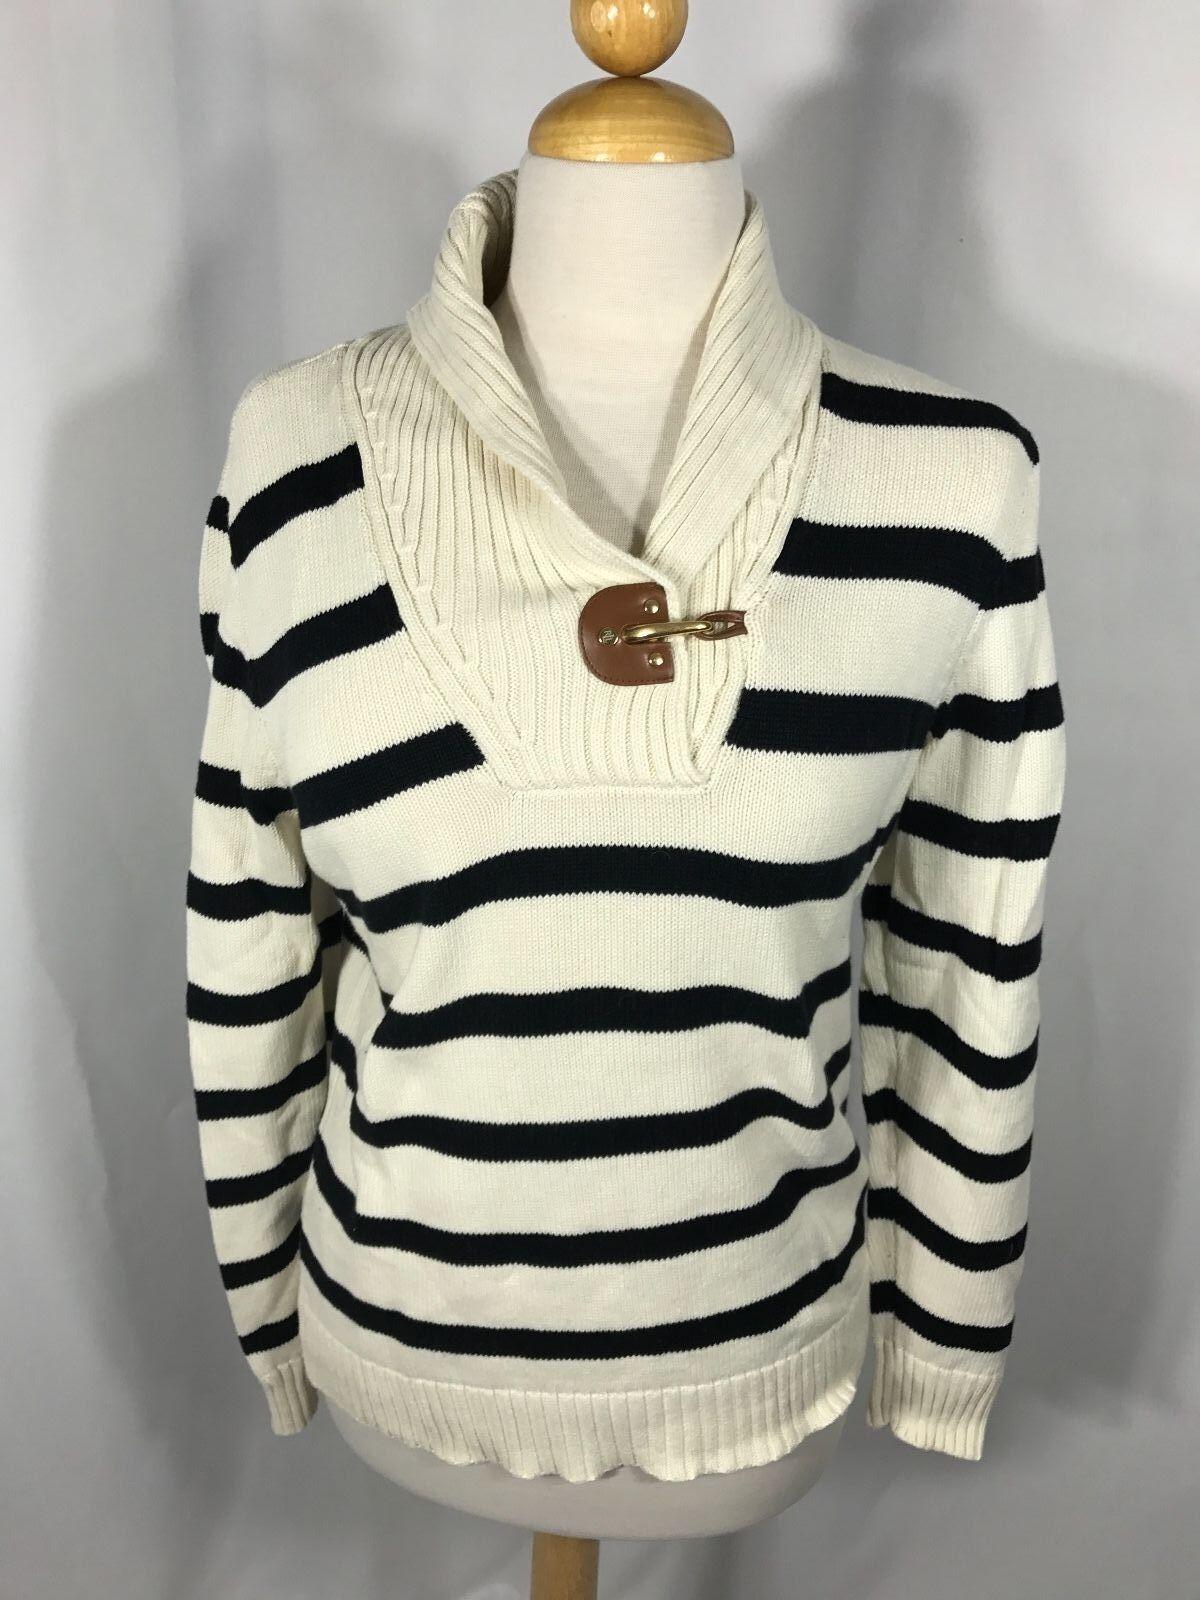 Ralph Lauren Women's White bluee Striped Sweater leather Trim L